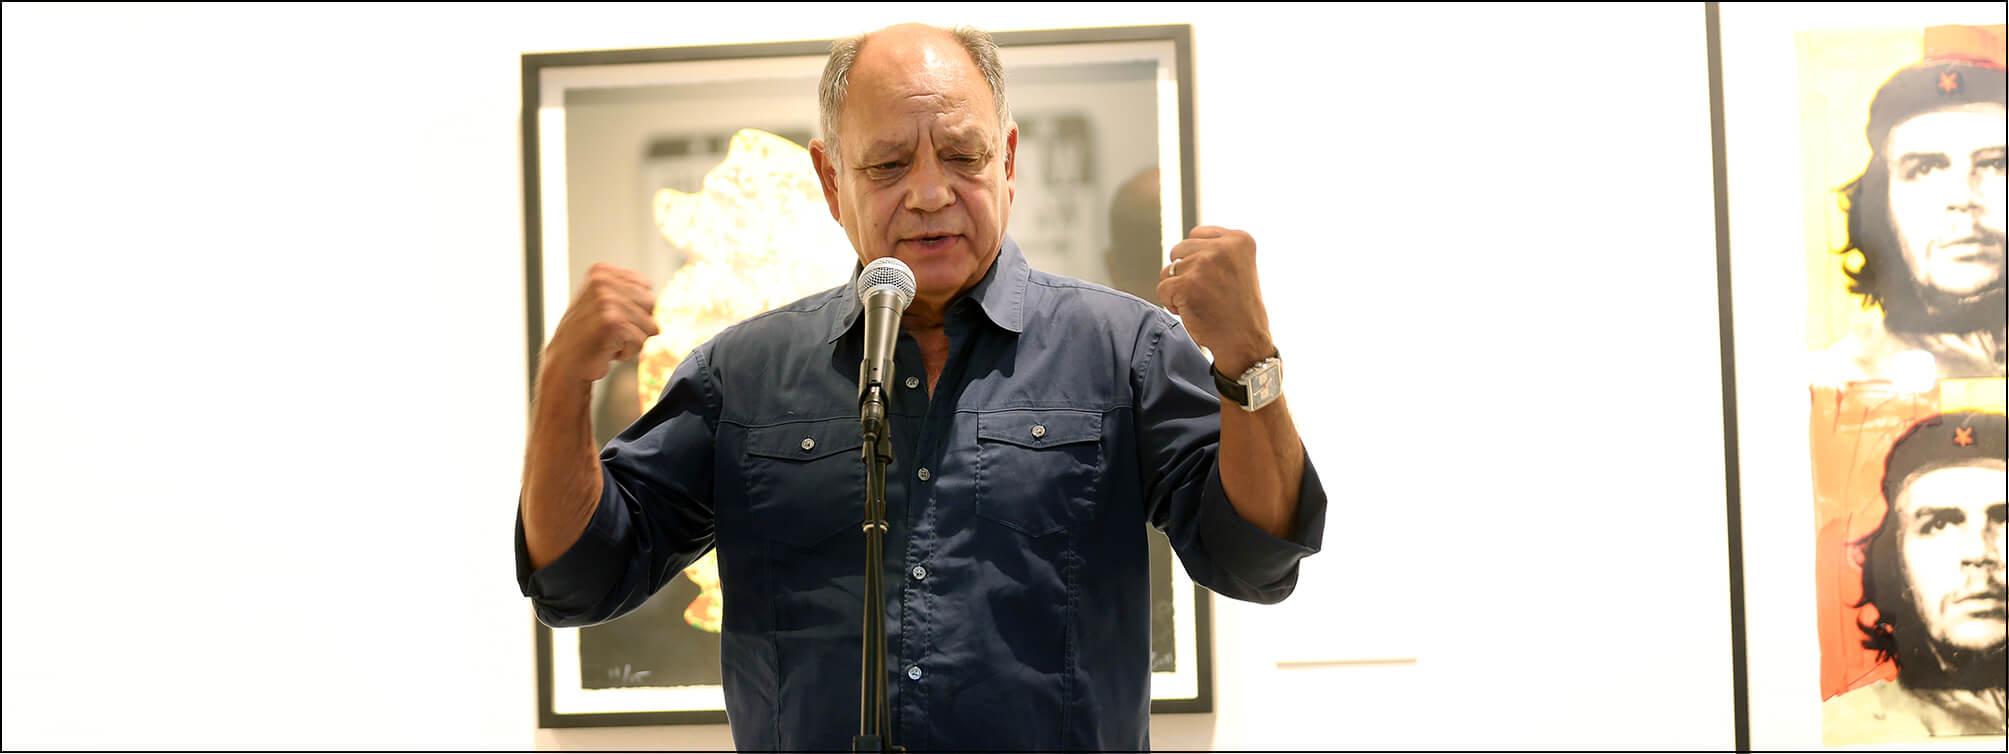 Cheech Marin speaks at Richard Duardo exhibit